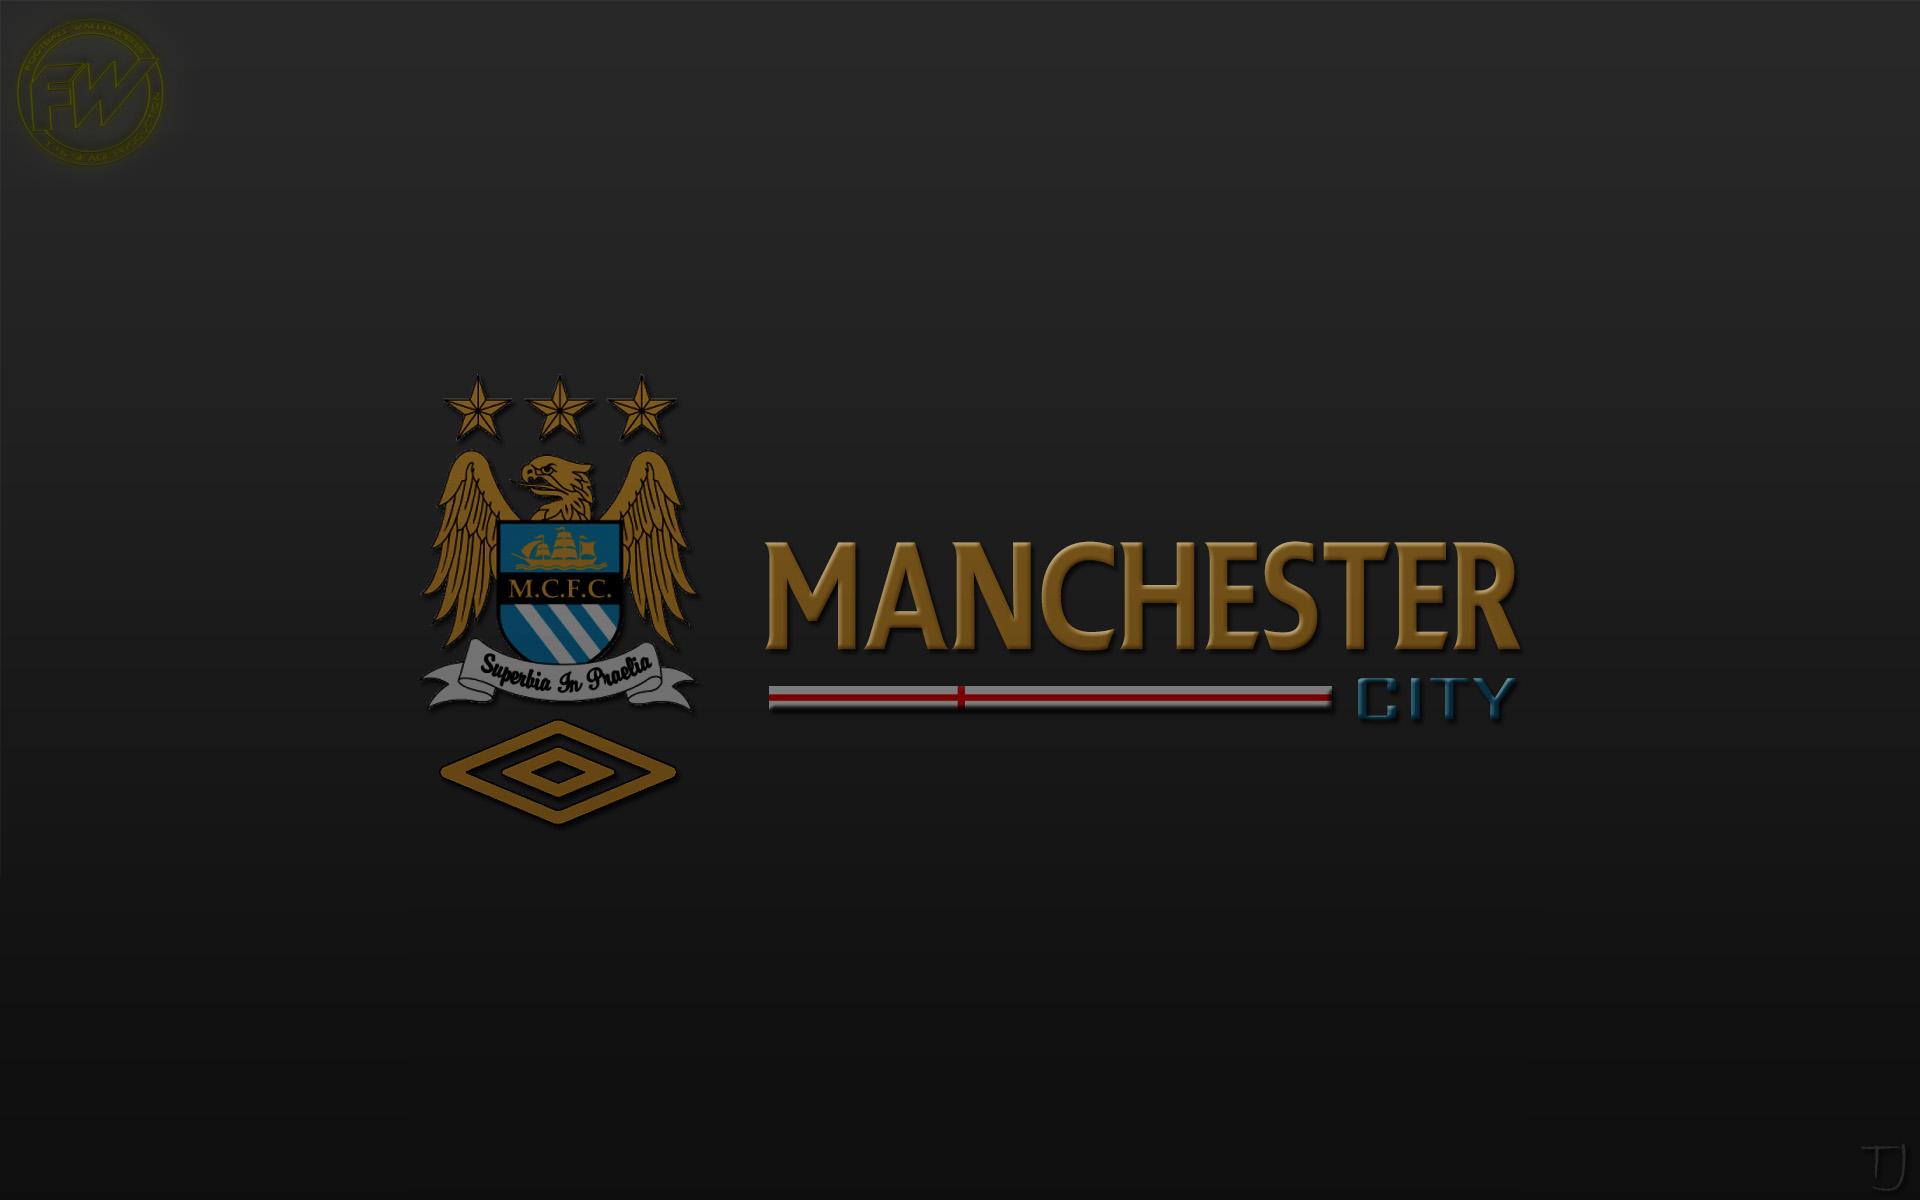 Manchester City Wallpaper 2016 Wallpapersafari